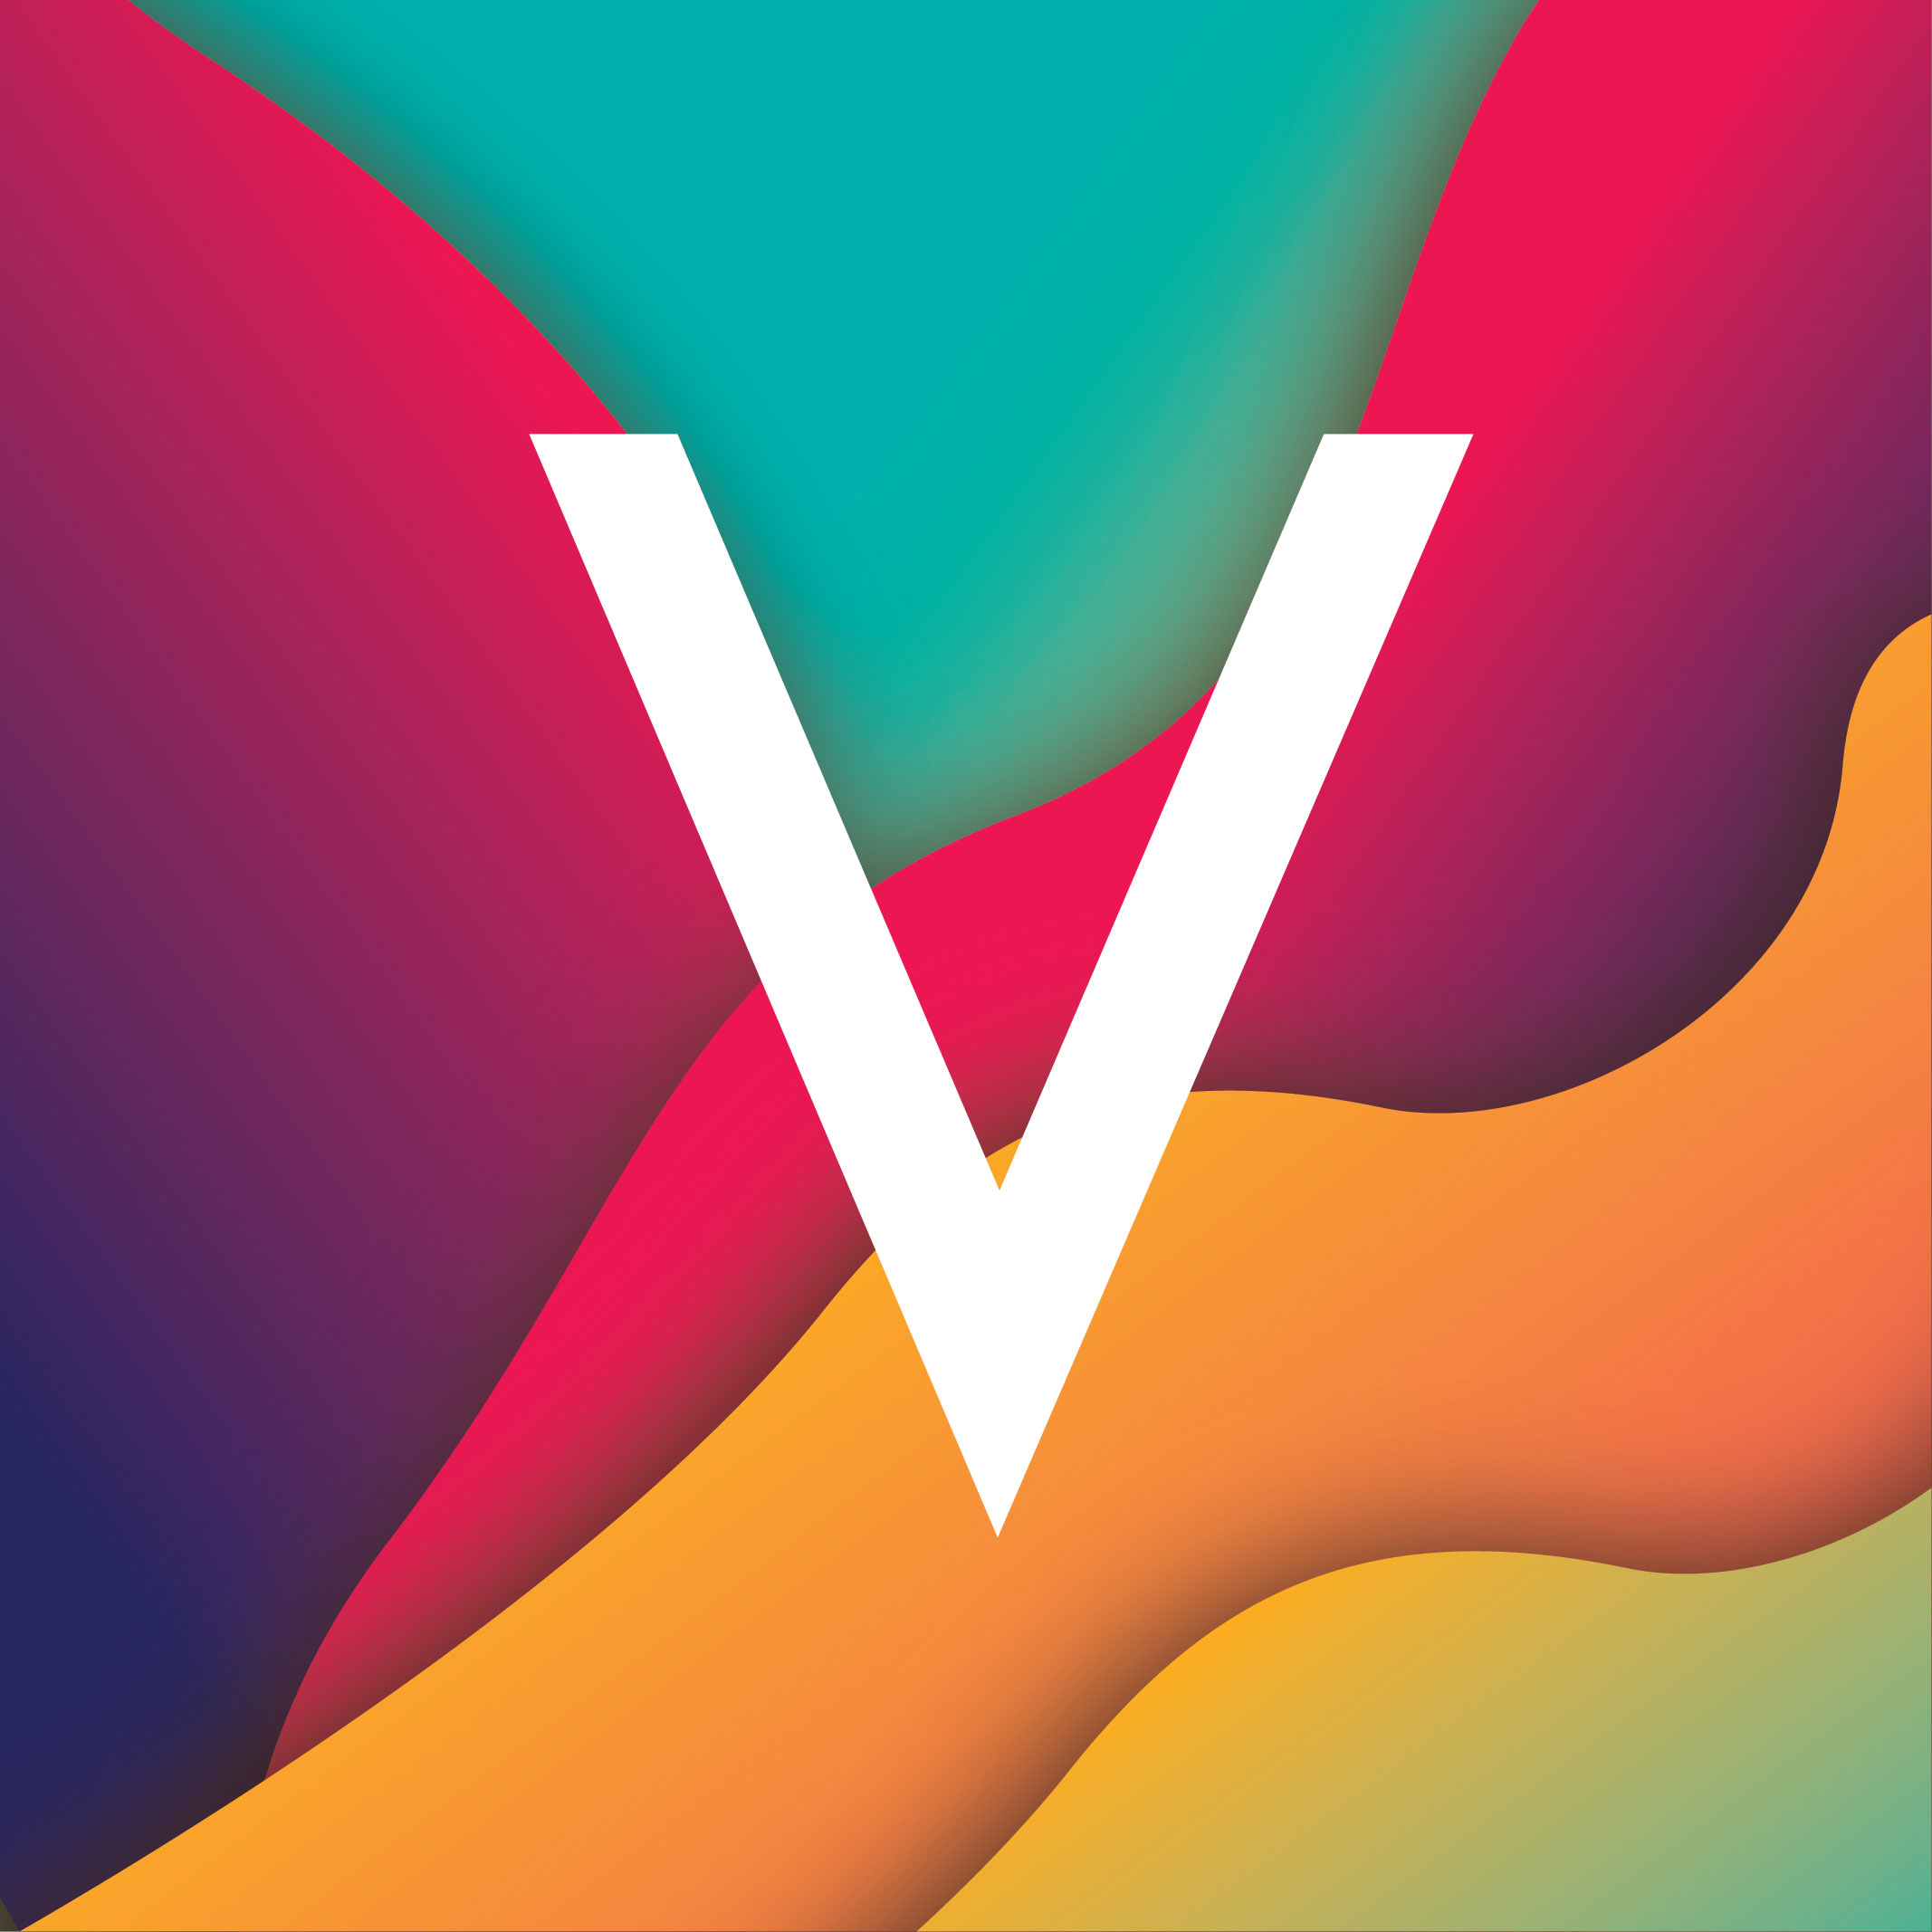 VR_NEXT_GENERATION_VIRTUAL_REALITY